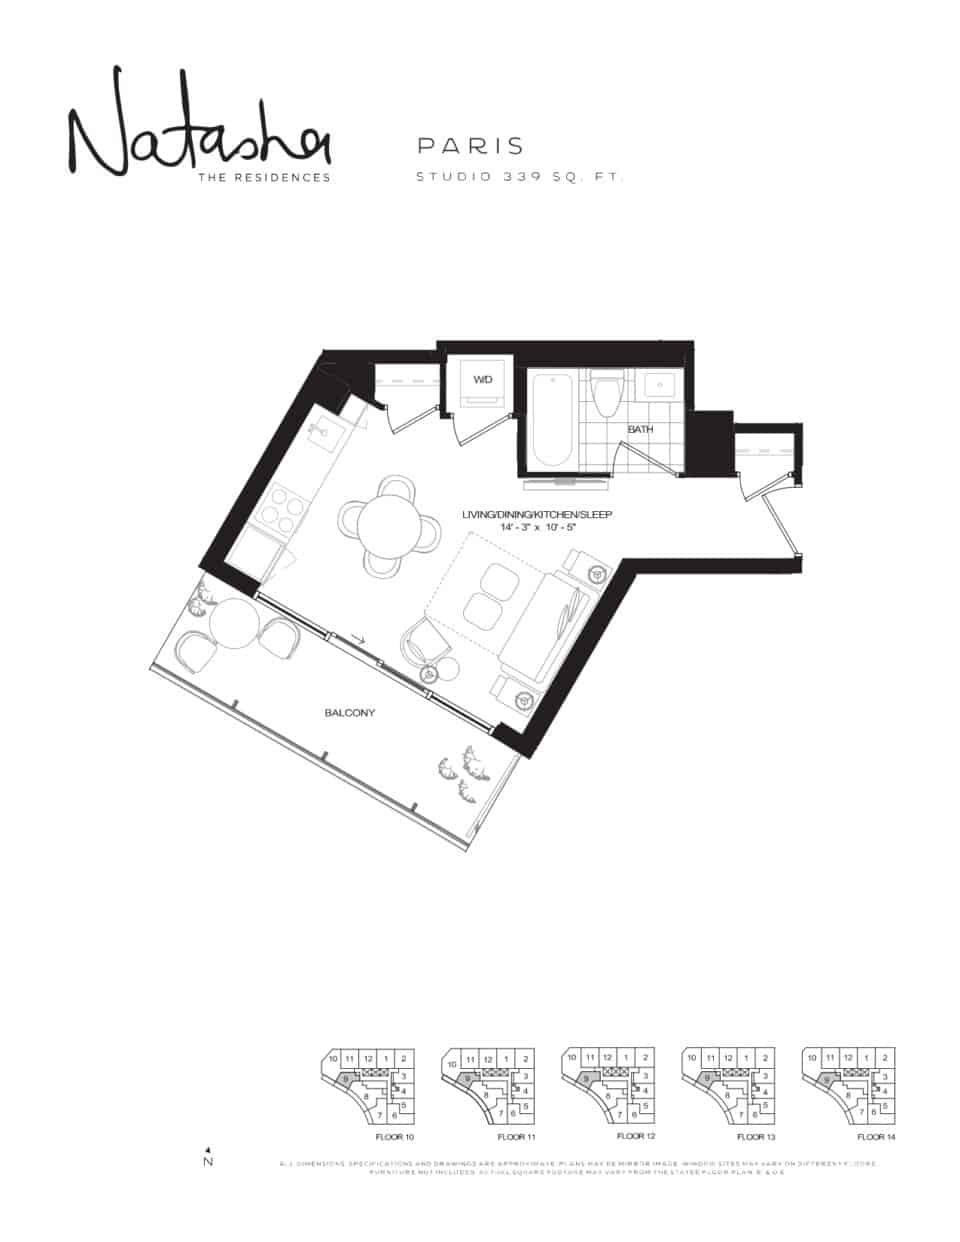 natasha residences paris floorplan